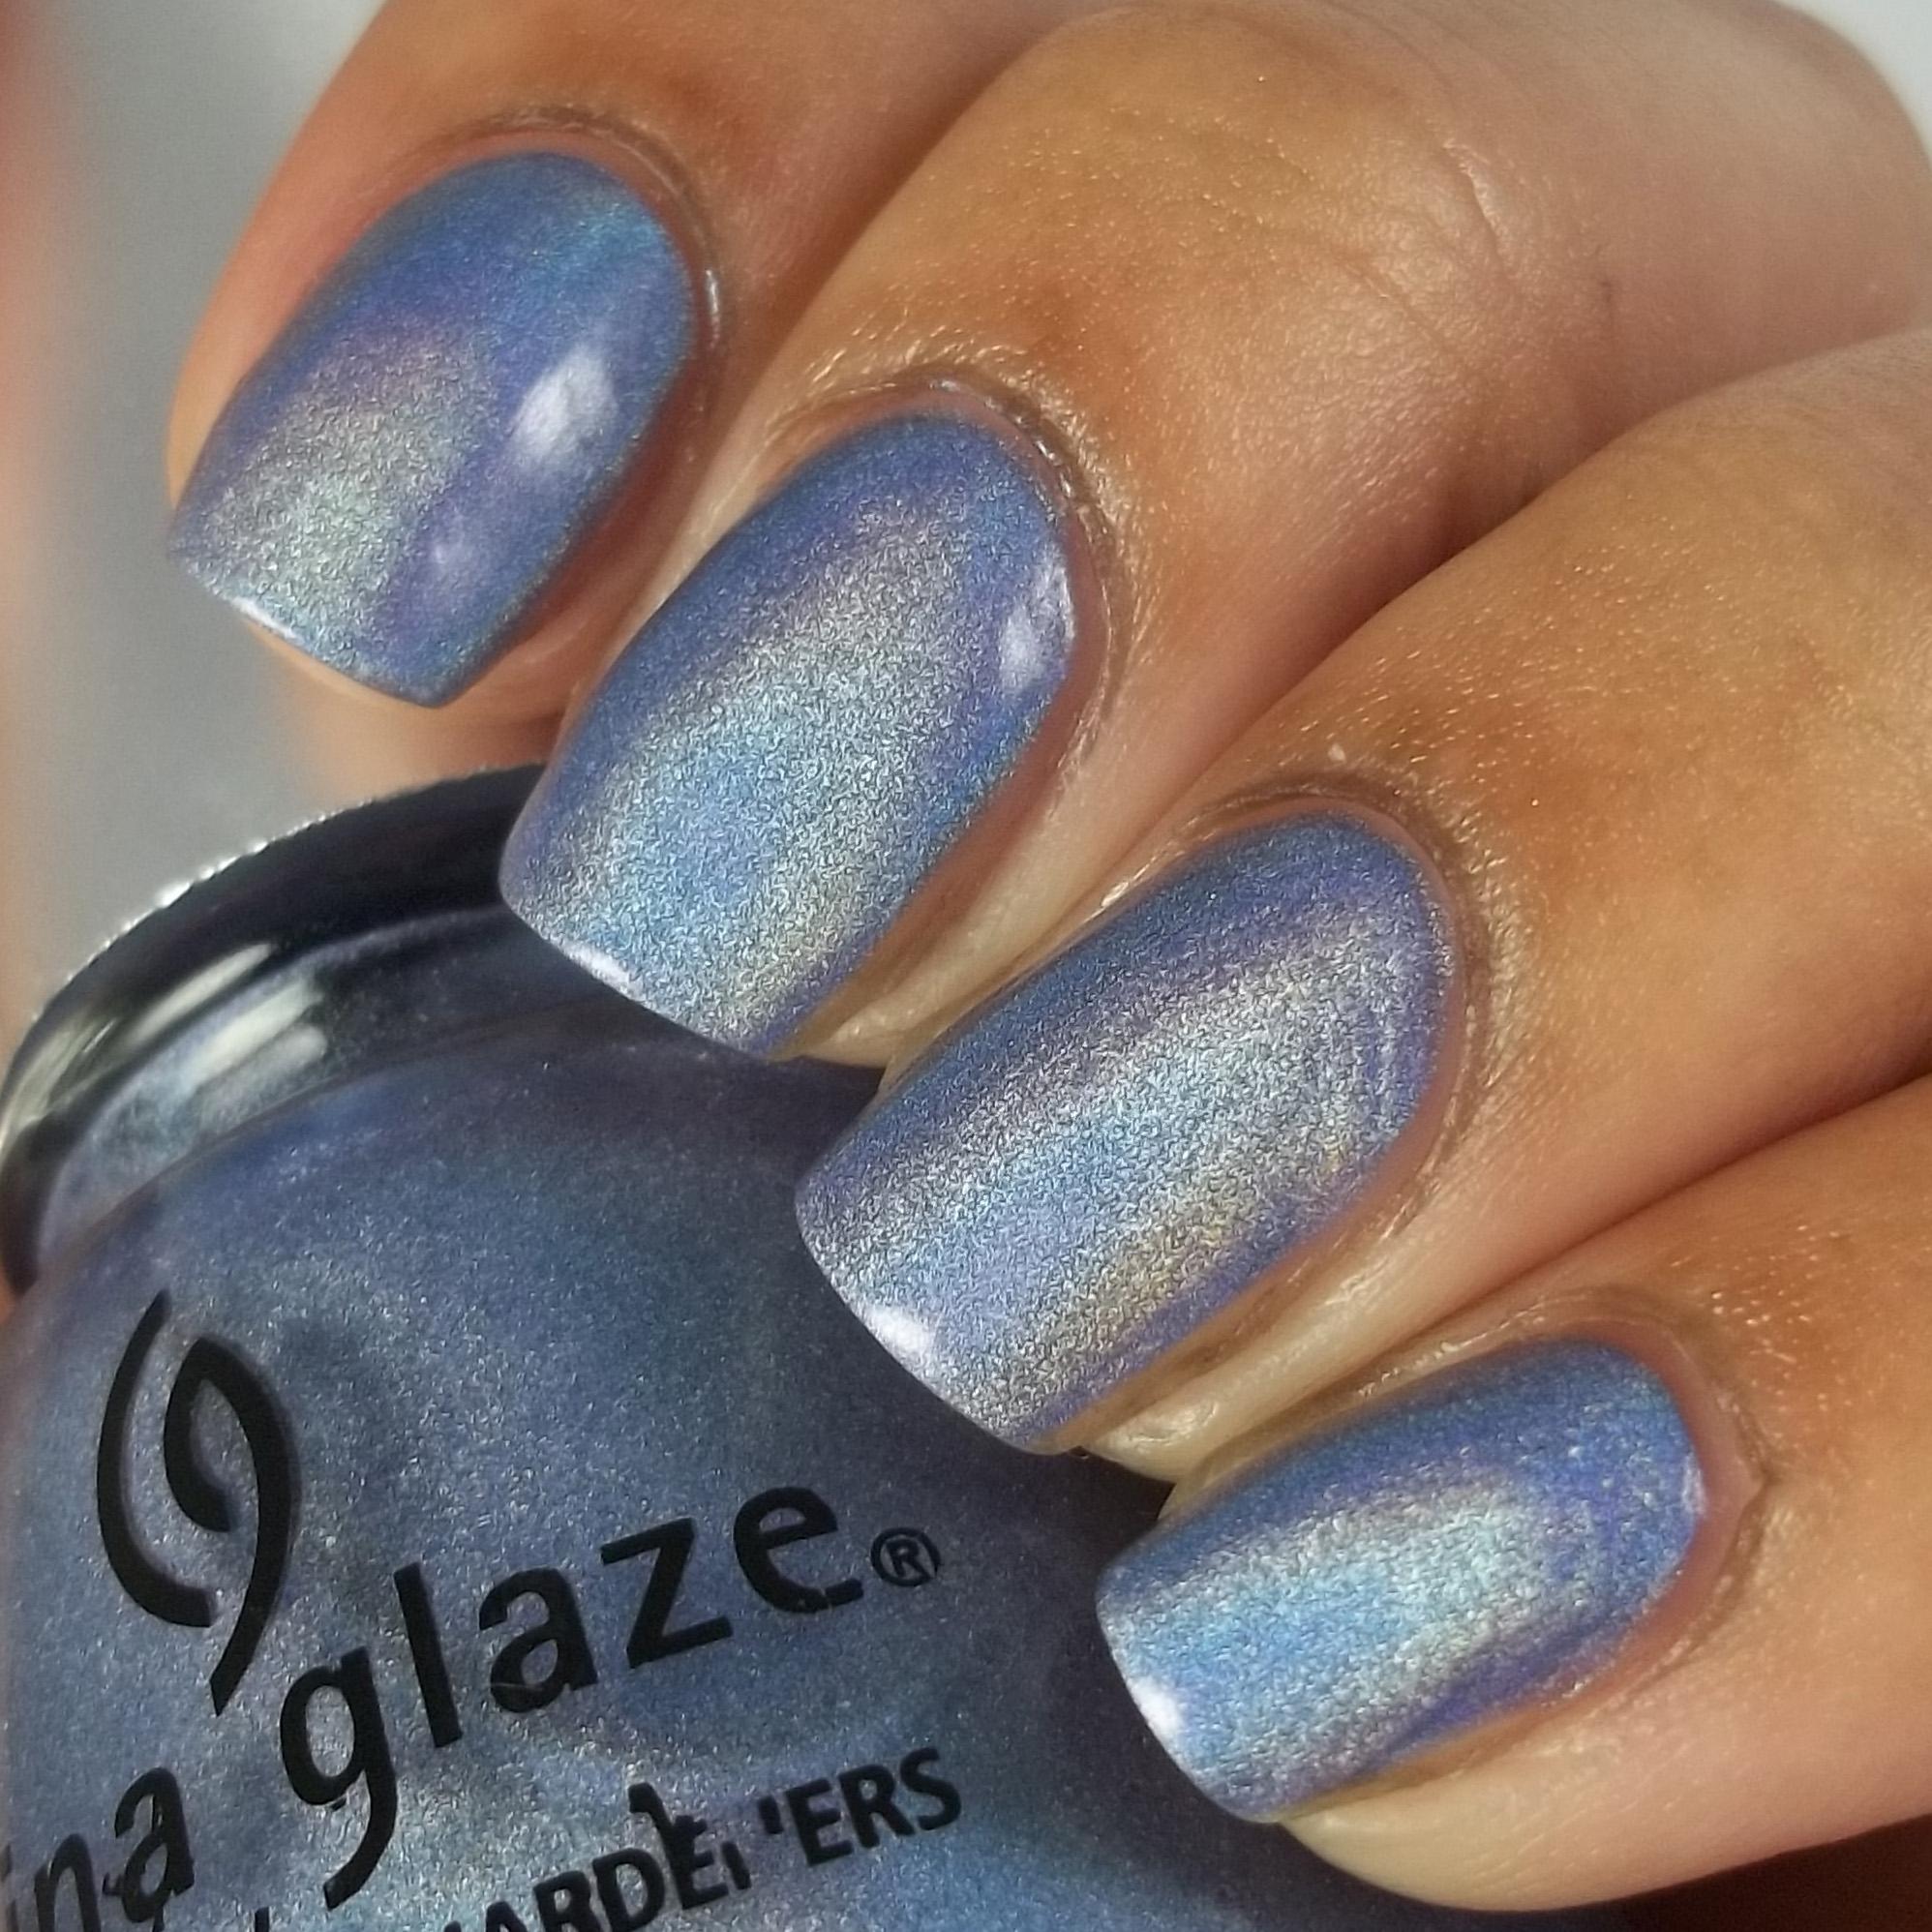 China Glaze OMG - 2NITE.jpg